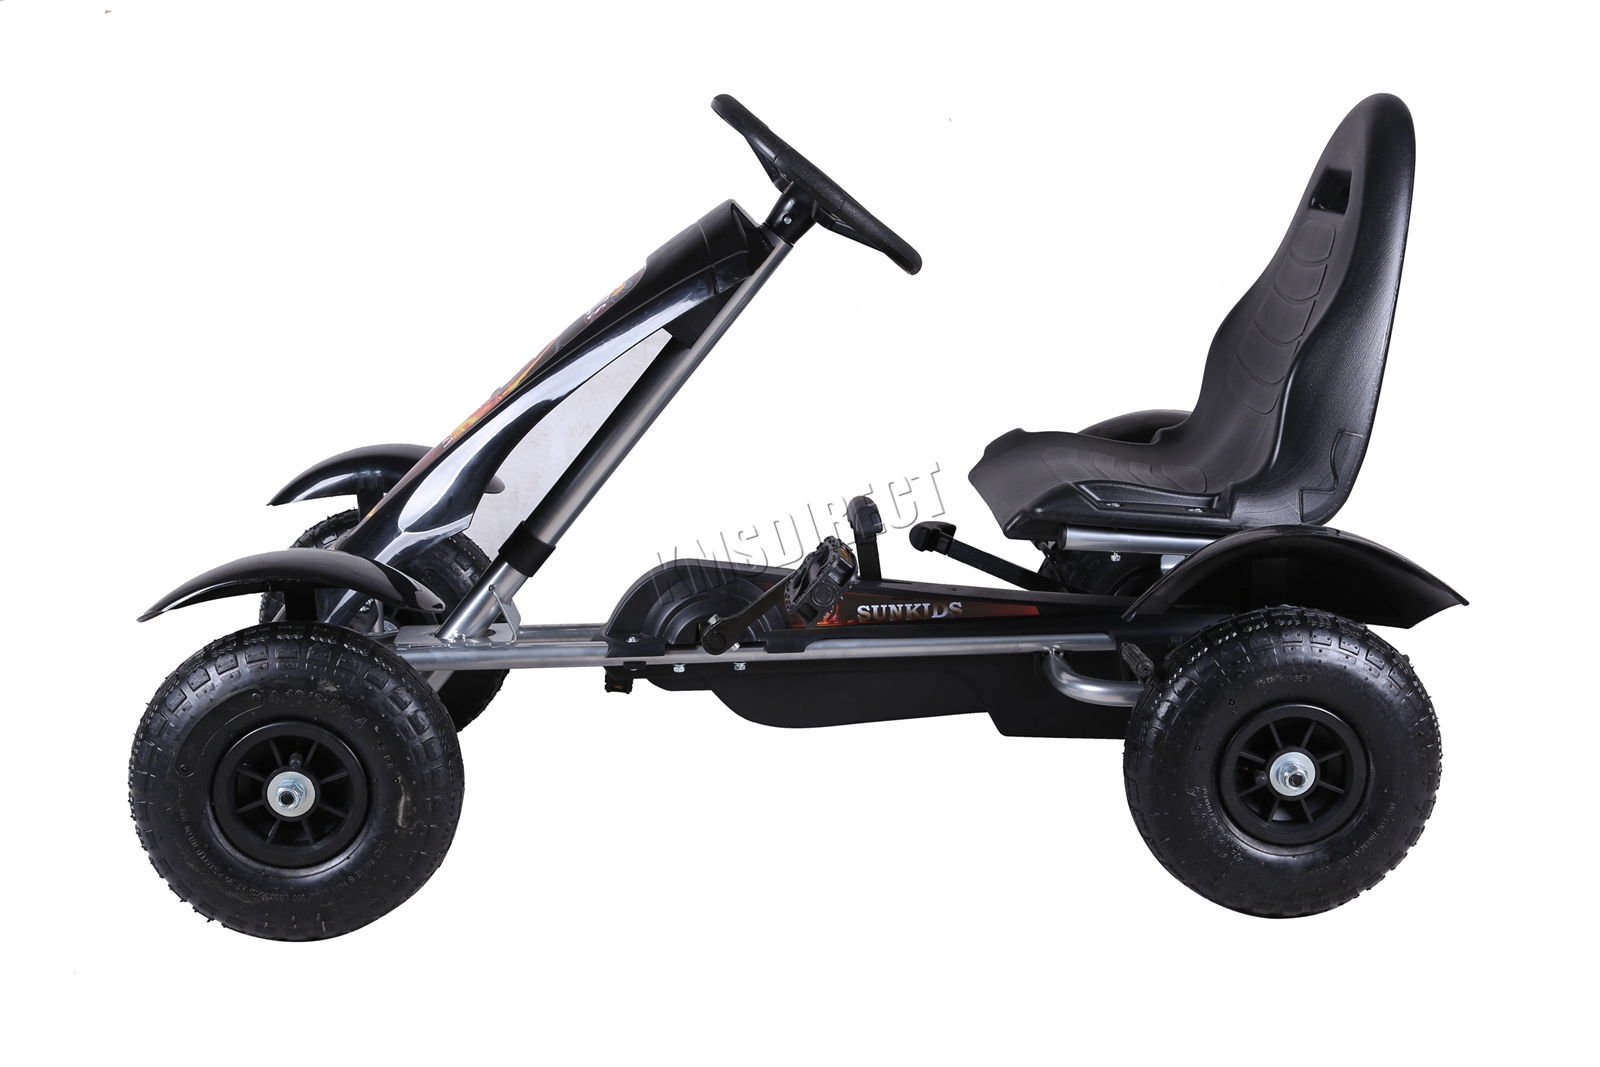 201701719267 2475 I 305 25 GOKART FH G03 BLACK KMSWM022 - Foxhunter Infantil Go Kart – Pedal Coche para Niños Gocart con Freno de Mano G03